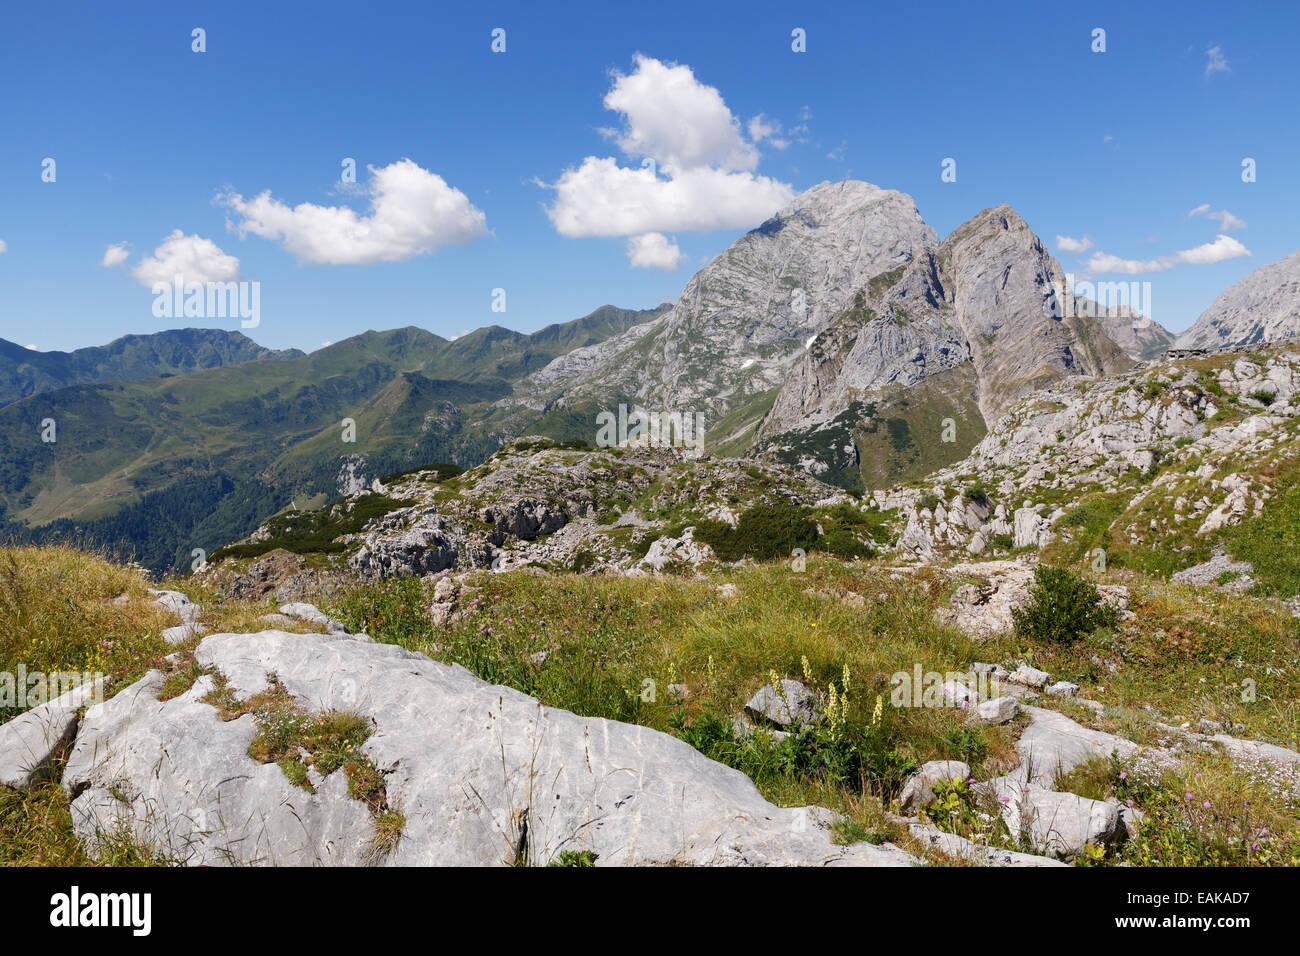 Summit plateau of Kleiner Pal Mountain, view towards Cellon Mountain, Carnic Alps, Kötschach-Mauthen, Bezirk - Stock Image